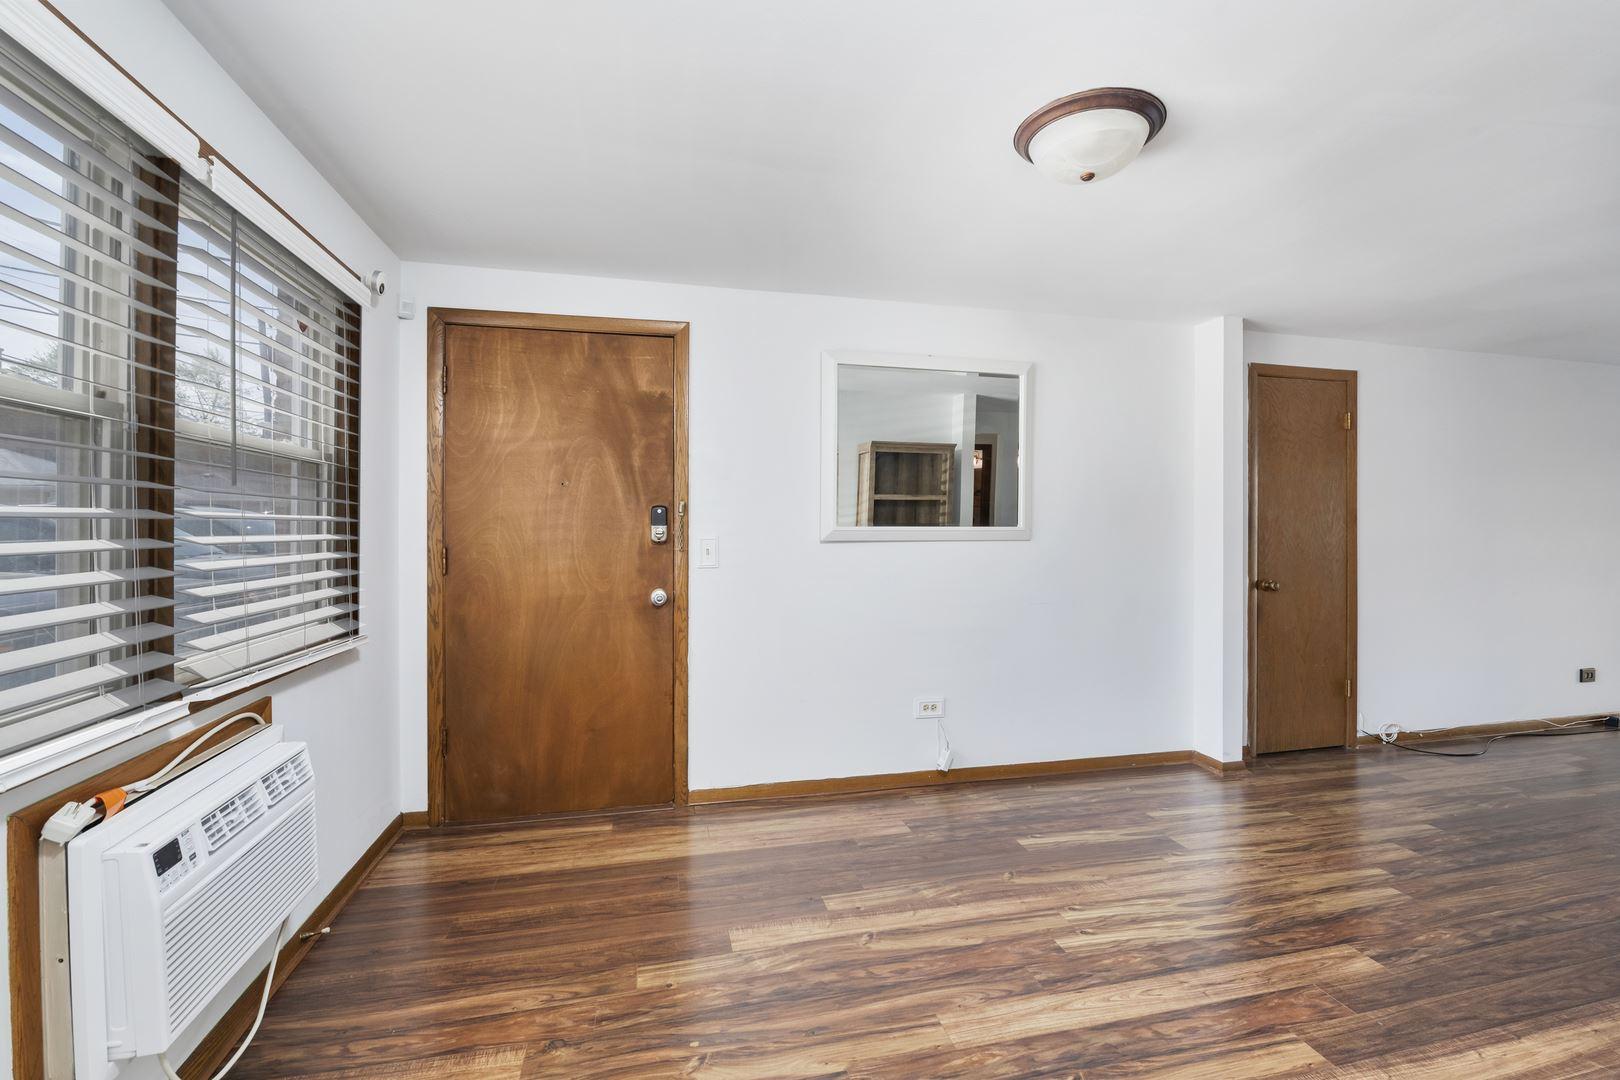 Photo of 6565 N Harlem Avenue #1N, Chicago, IL 60631 (MLS # 11020264)